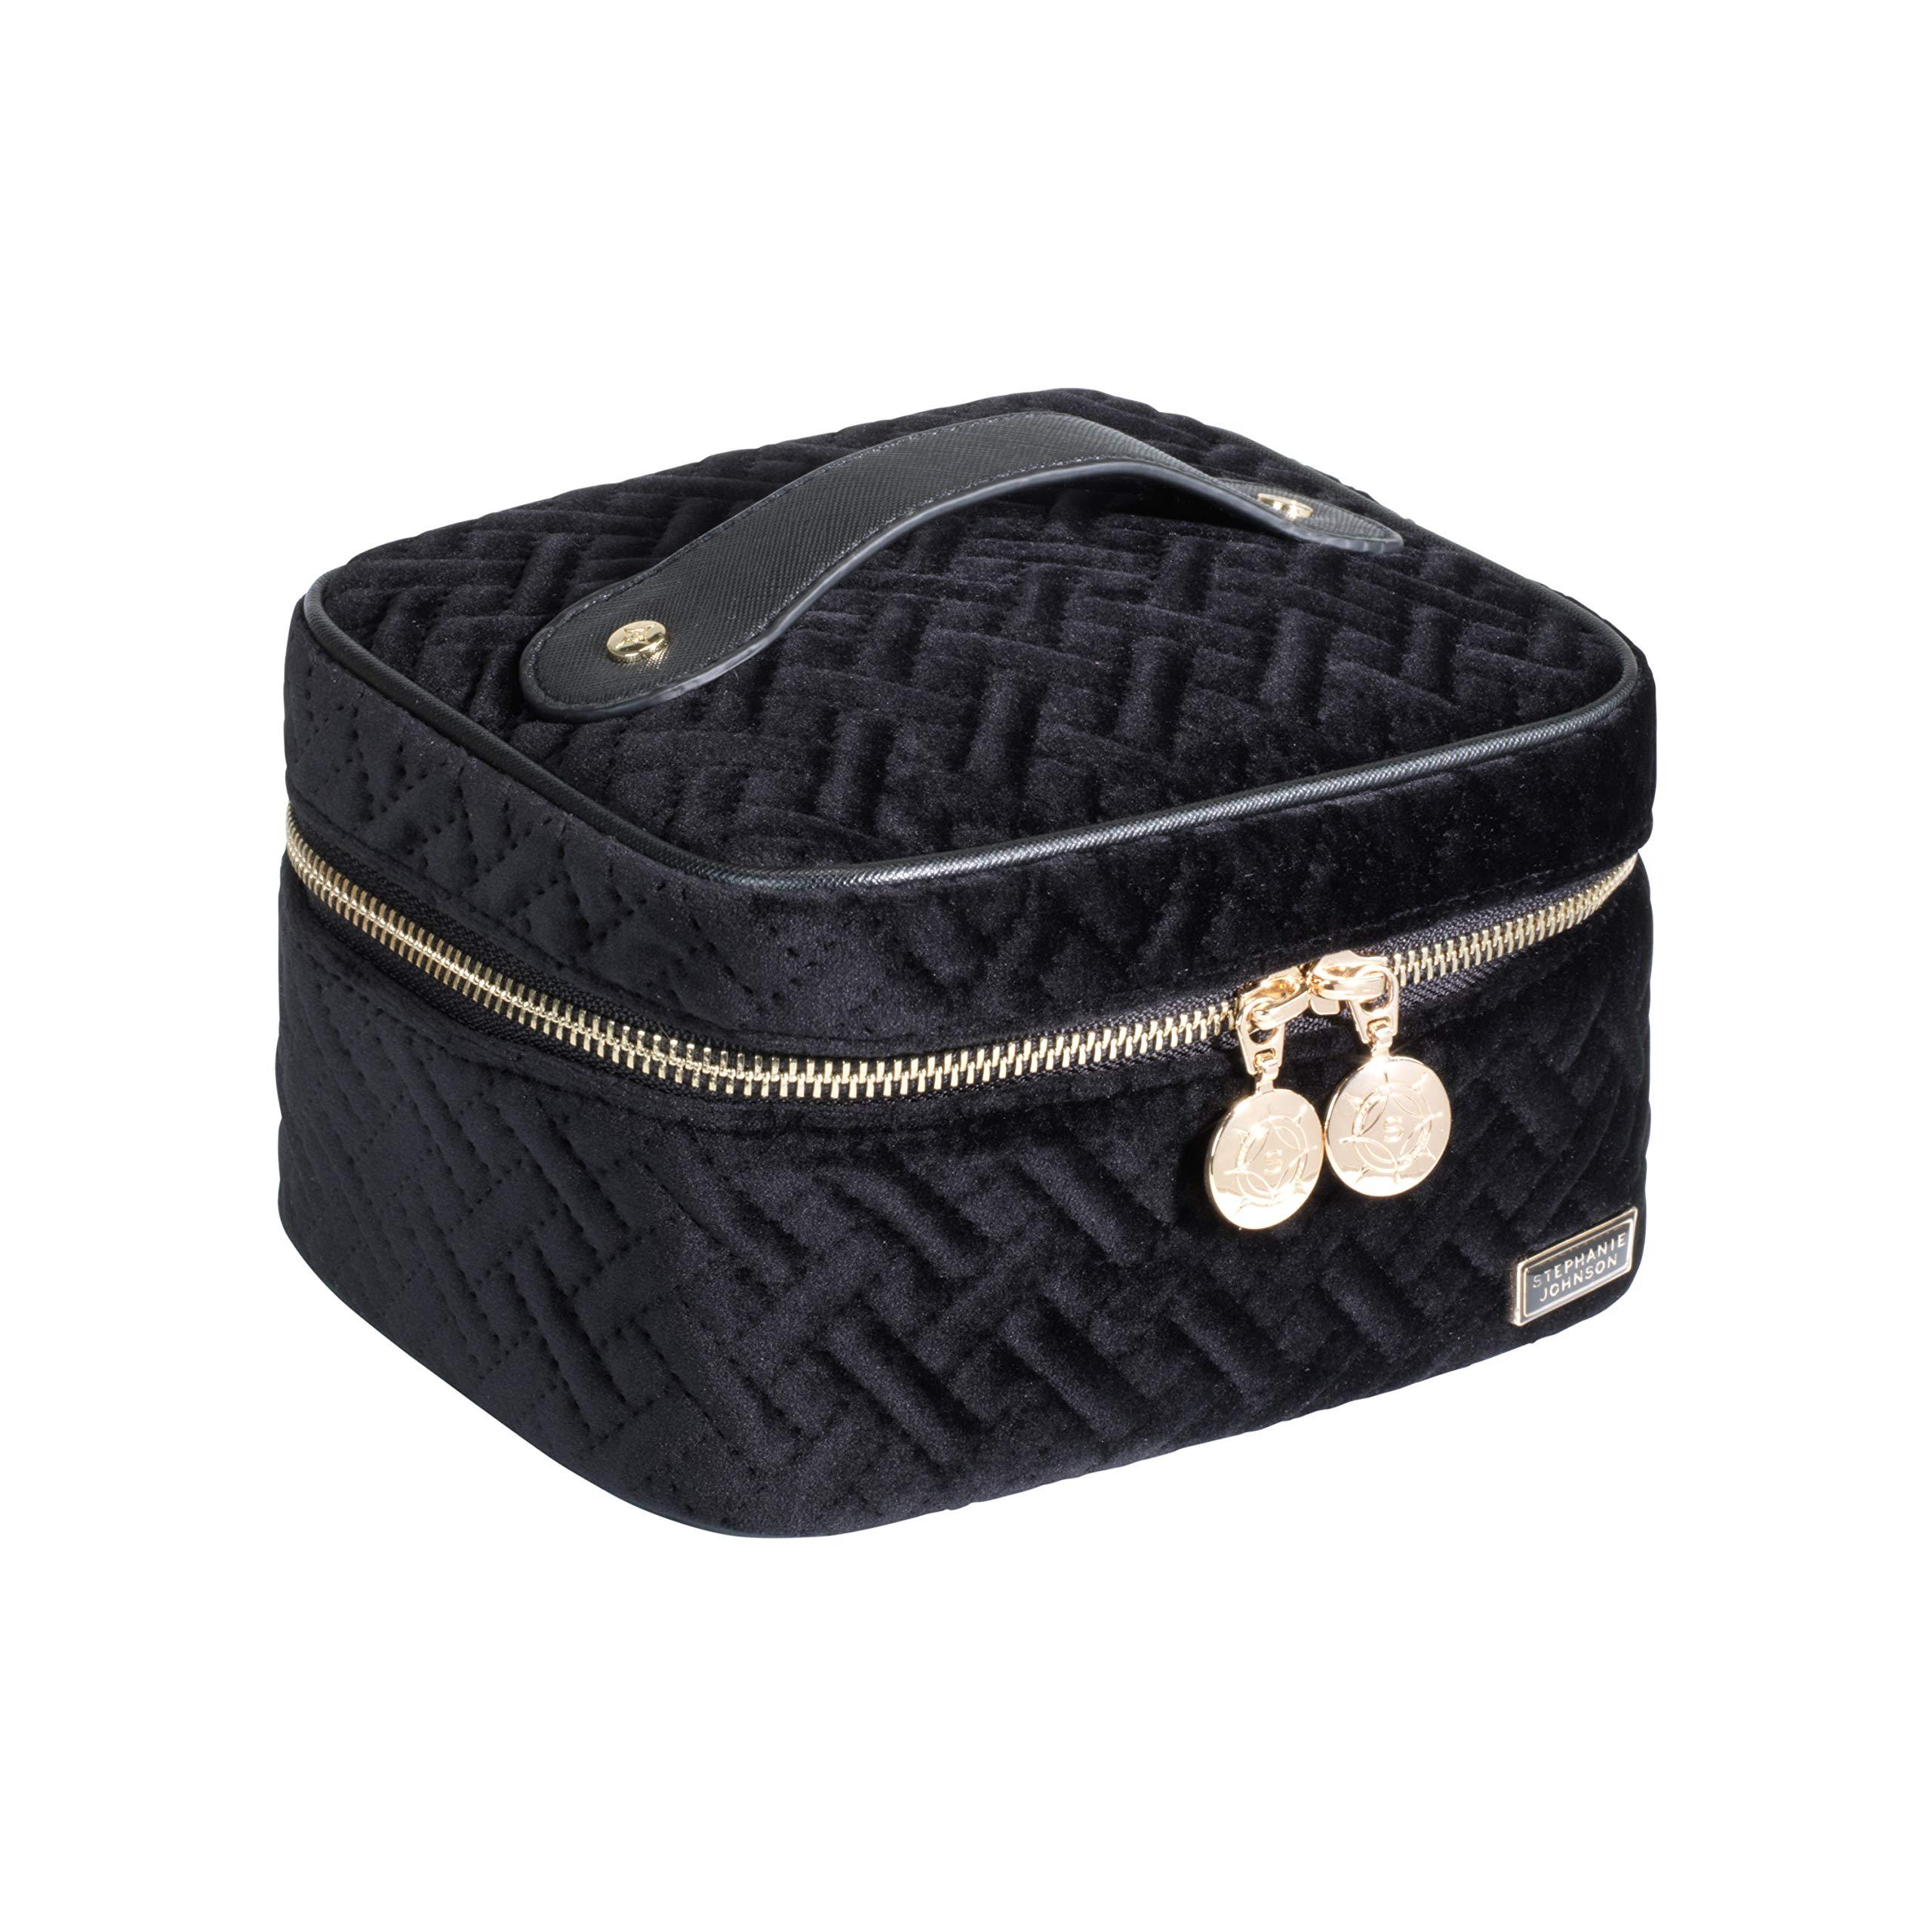 Stephanie Johnson Women's Milan Louise Travel Case Purse, Black, One Size by Stephanie Johnson